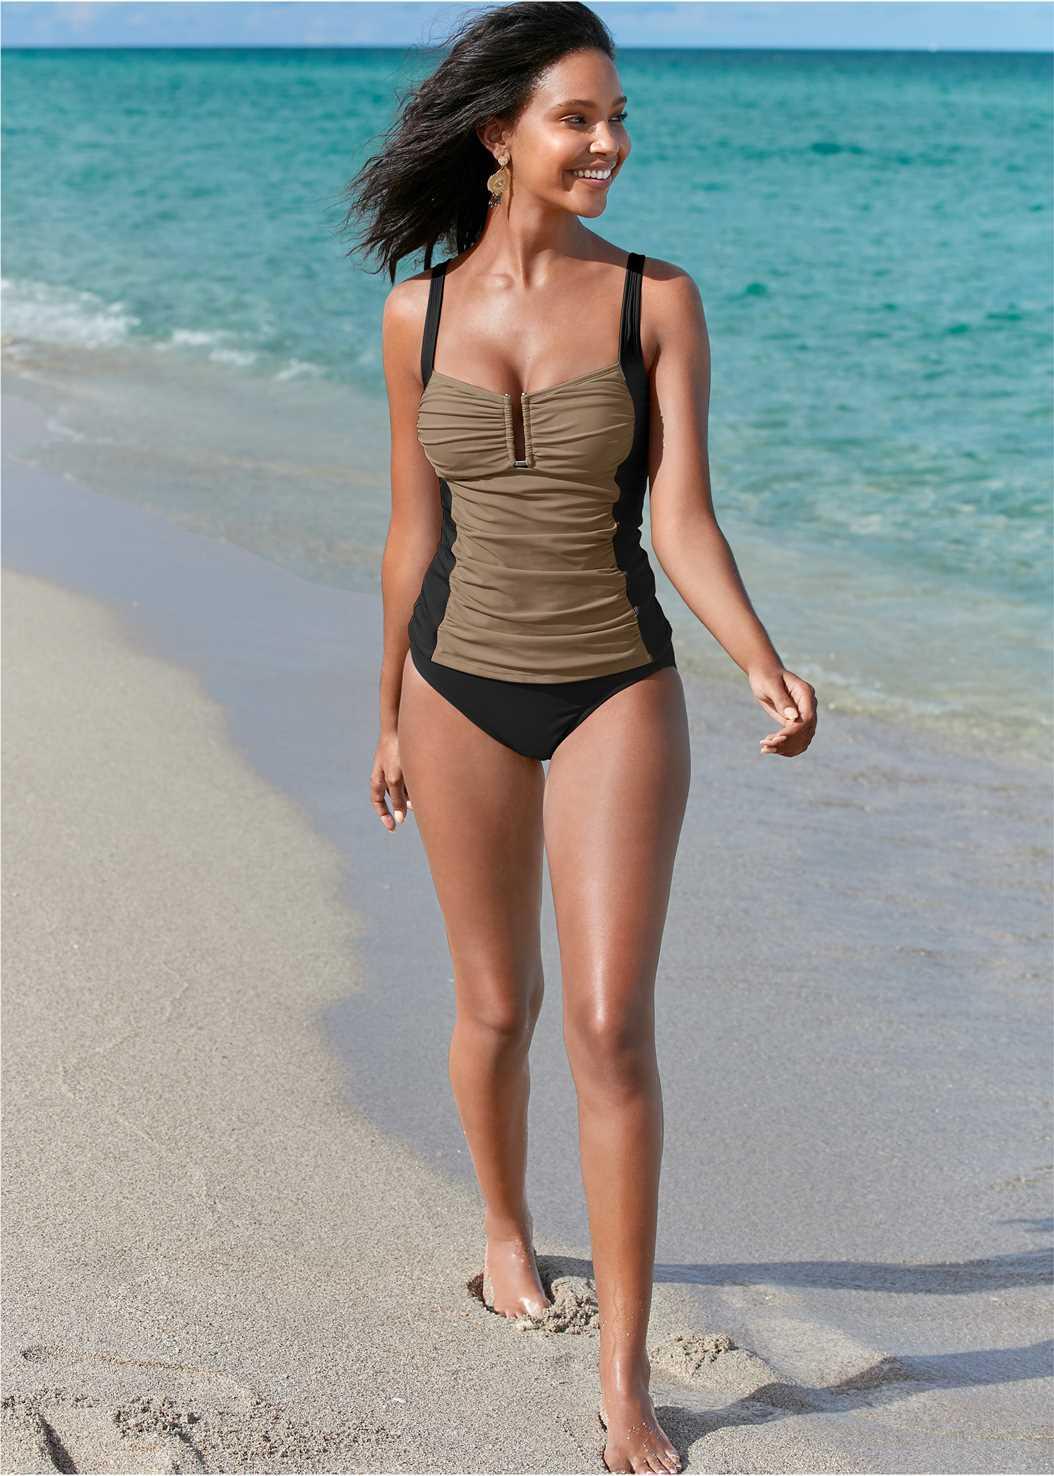 Slenderizing Tankini Top,Mid Rise Hipster Classic Bikini Bottom,Full Coverage Mid Rise Hipster Bikini Bottom,Swim Short,Mesh Trimmed Cover-Up Dress